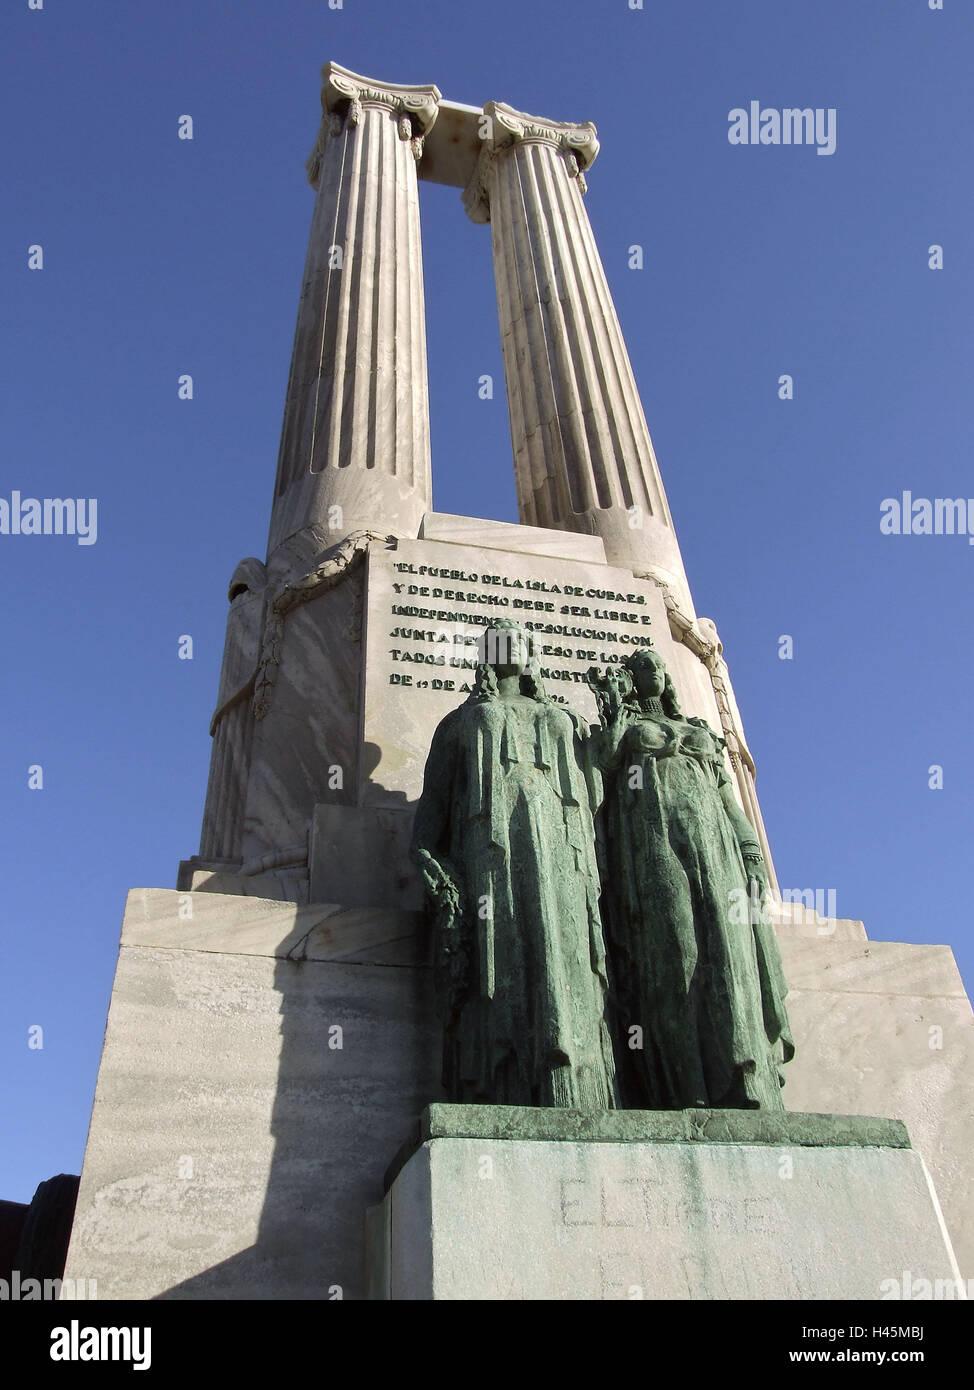 Cuba havana malecon monumento a read victimas del maine holiday destination